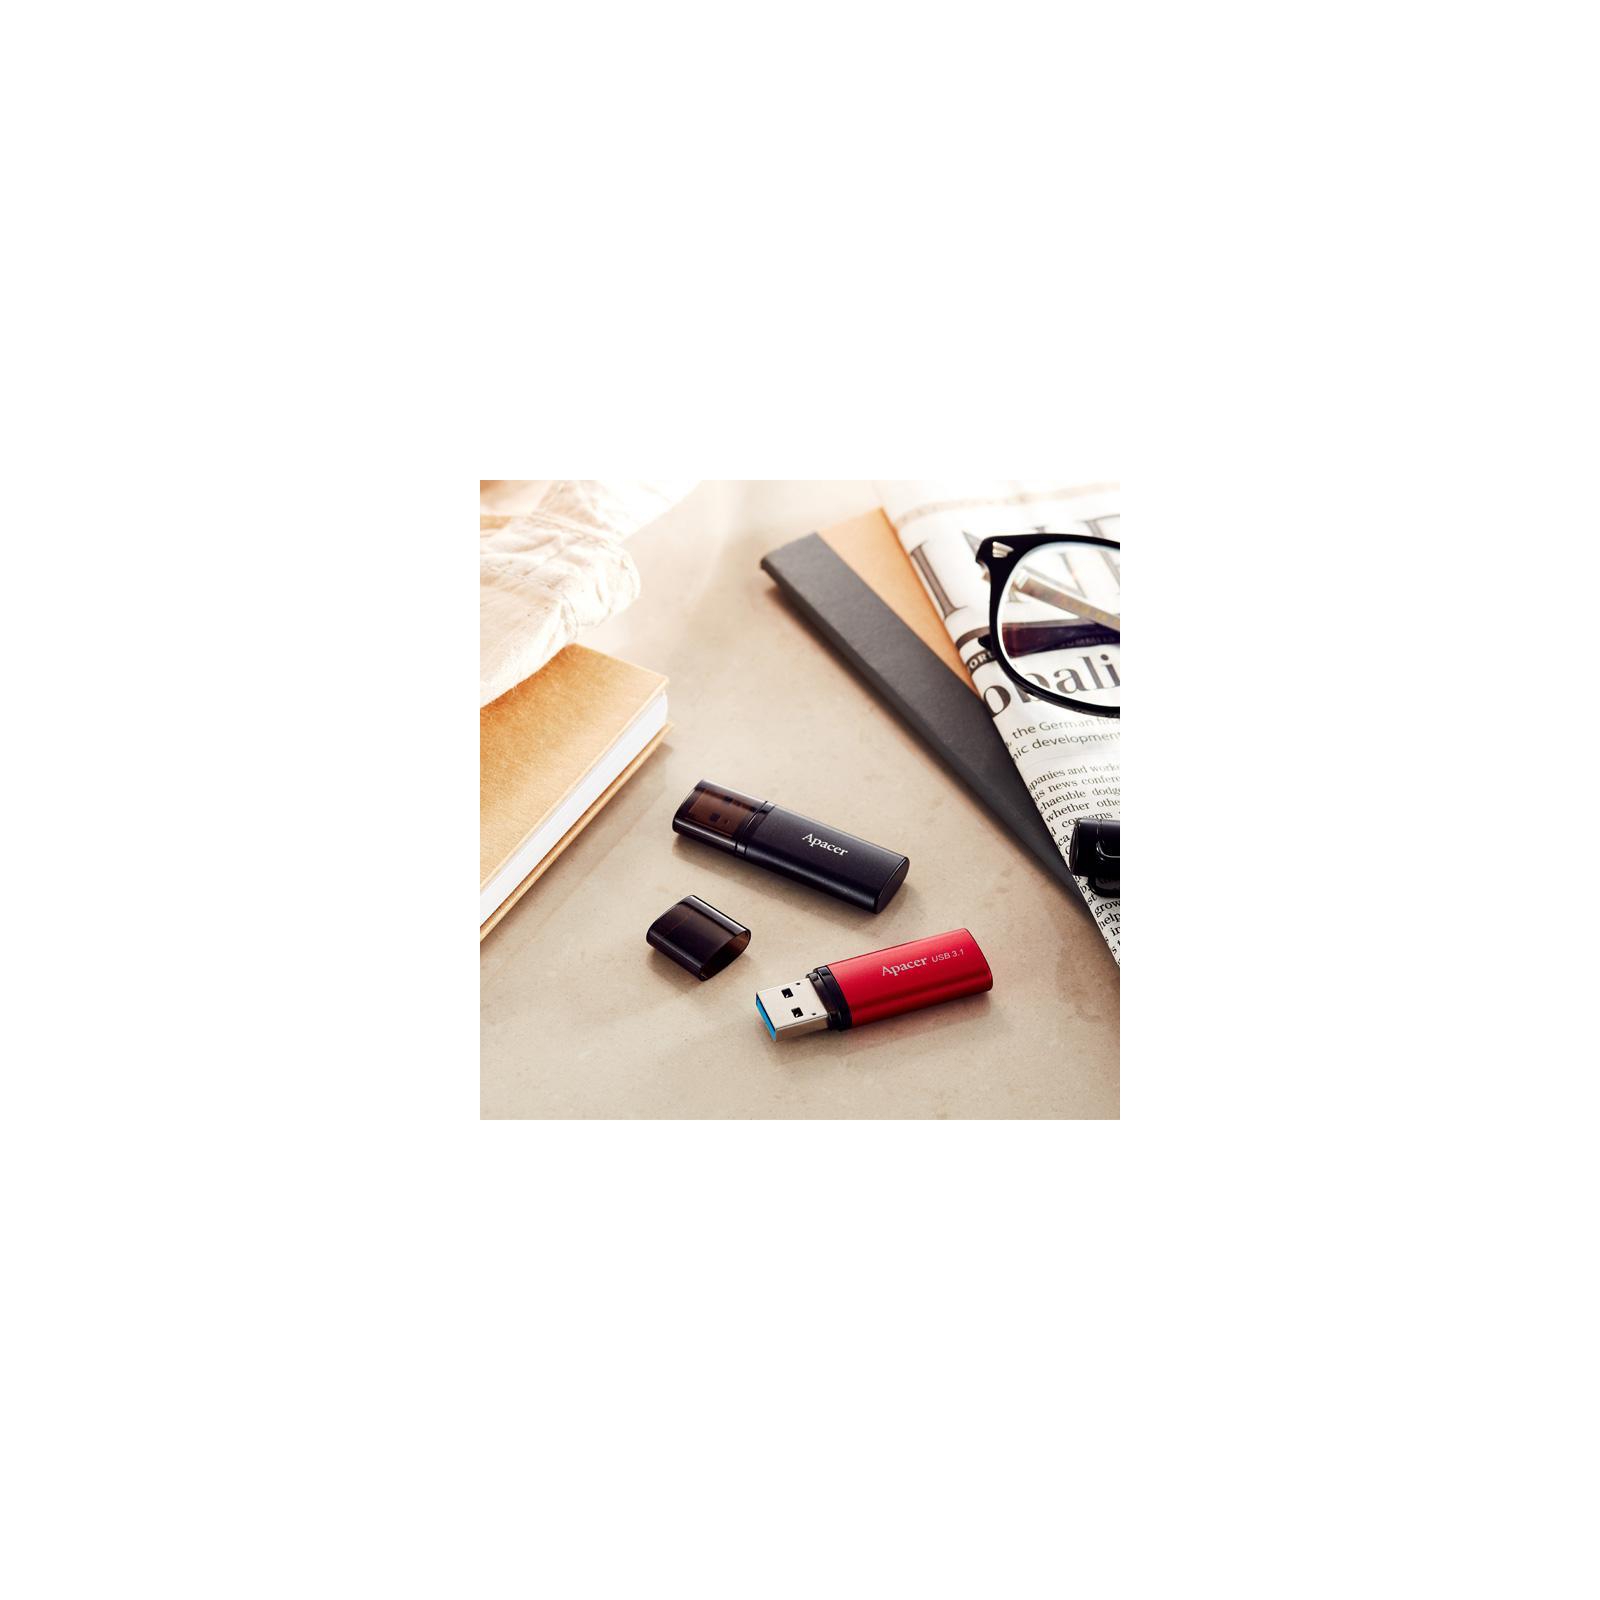 USB флеш накопитель Apacer 128GB AH25B Red USB 3.1 Gen1 (AP128GAH25BR-1) изображение 5